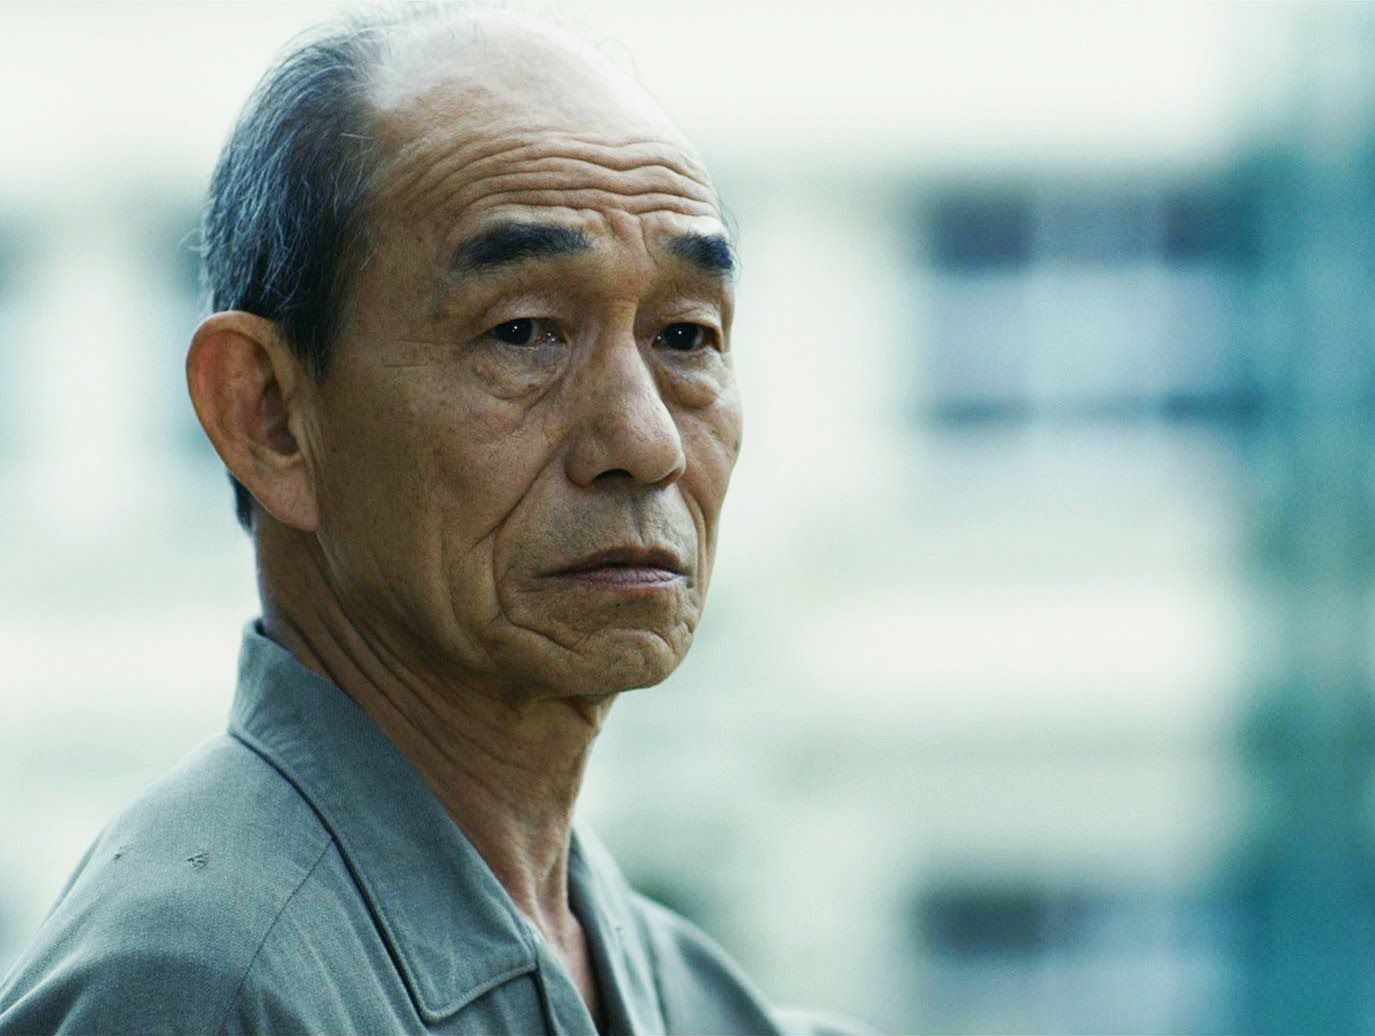 笹野高史が熱演!映画『陽光桜-YOKO THE CHERRY BLOSSOM-』予告編 ...